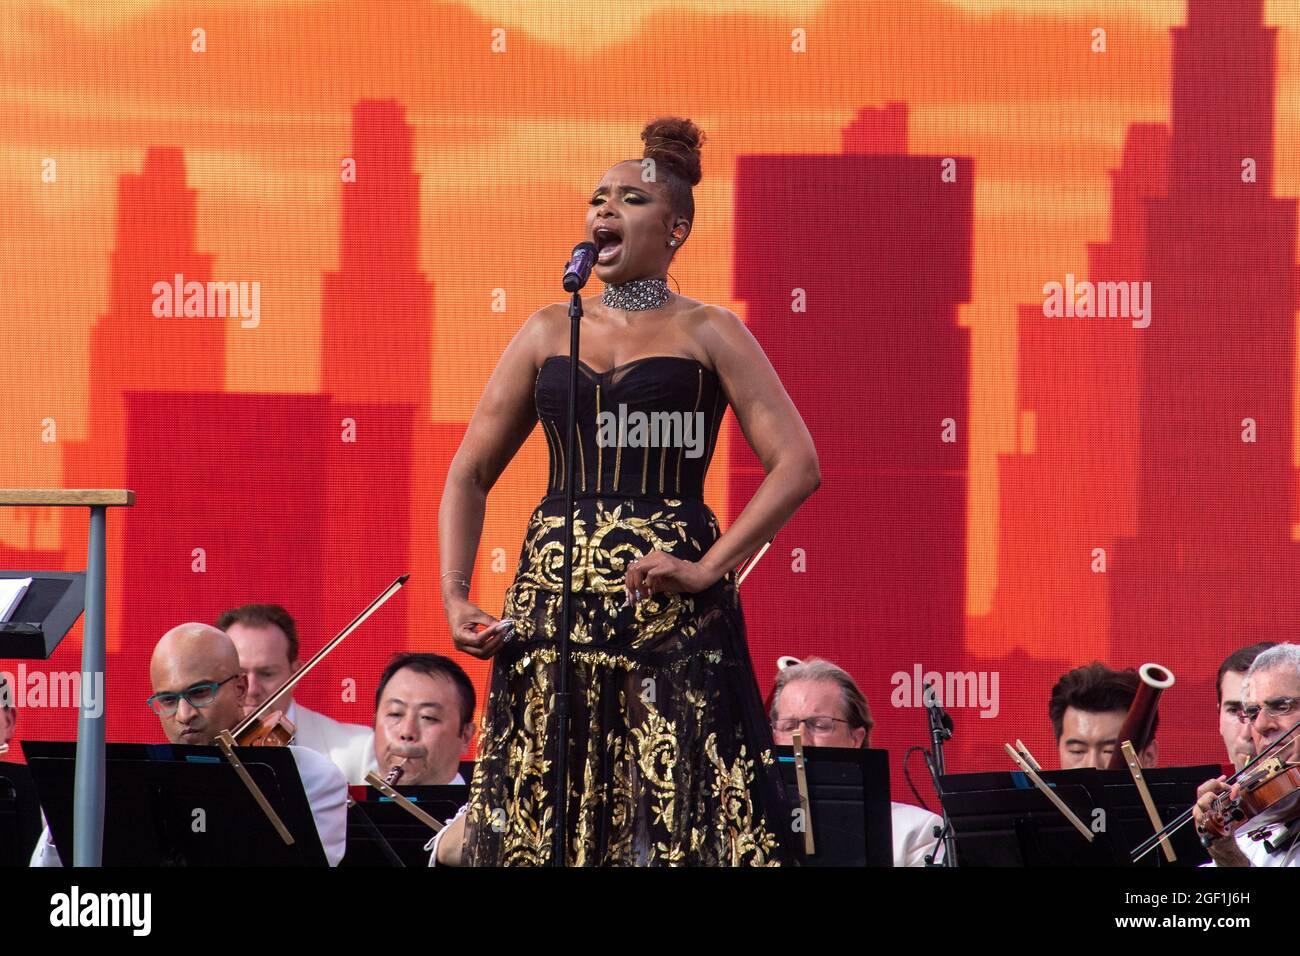 "NEW YORK, NY - 21. AUGUST: Die Sängerin Jennifer Hudson tritt am 21. August 2021 im Great Lawn im Central Park in New York City beim ""We Love NYC: The Homecoming Concert"" auf. Stockfoto"